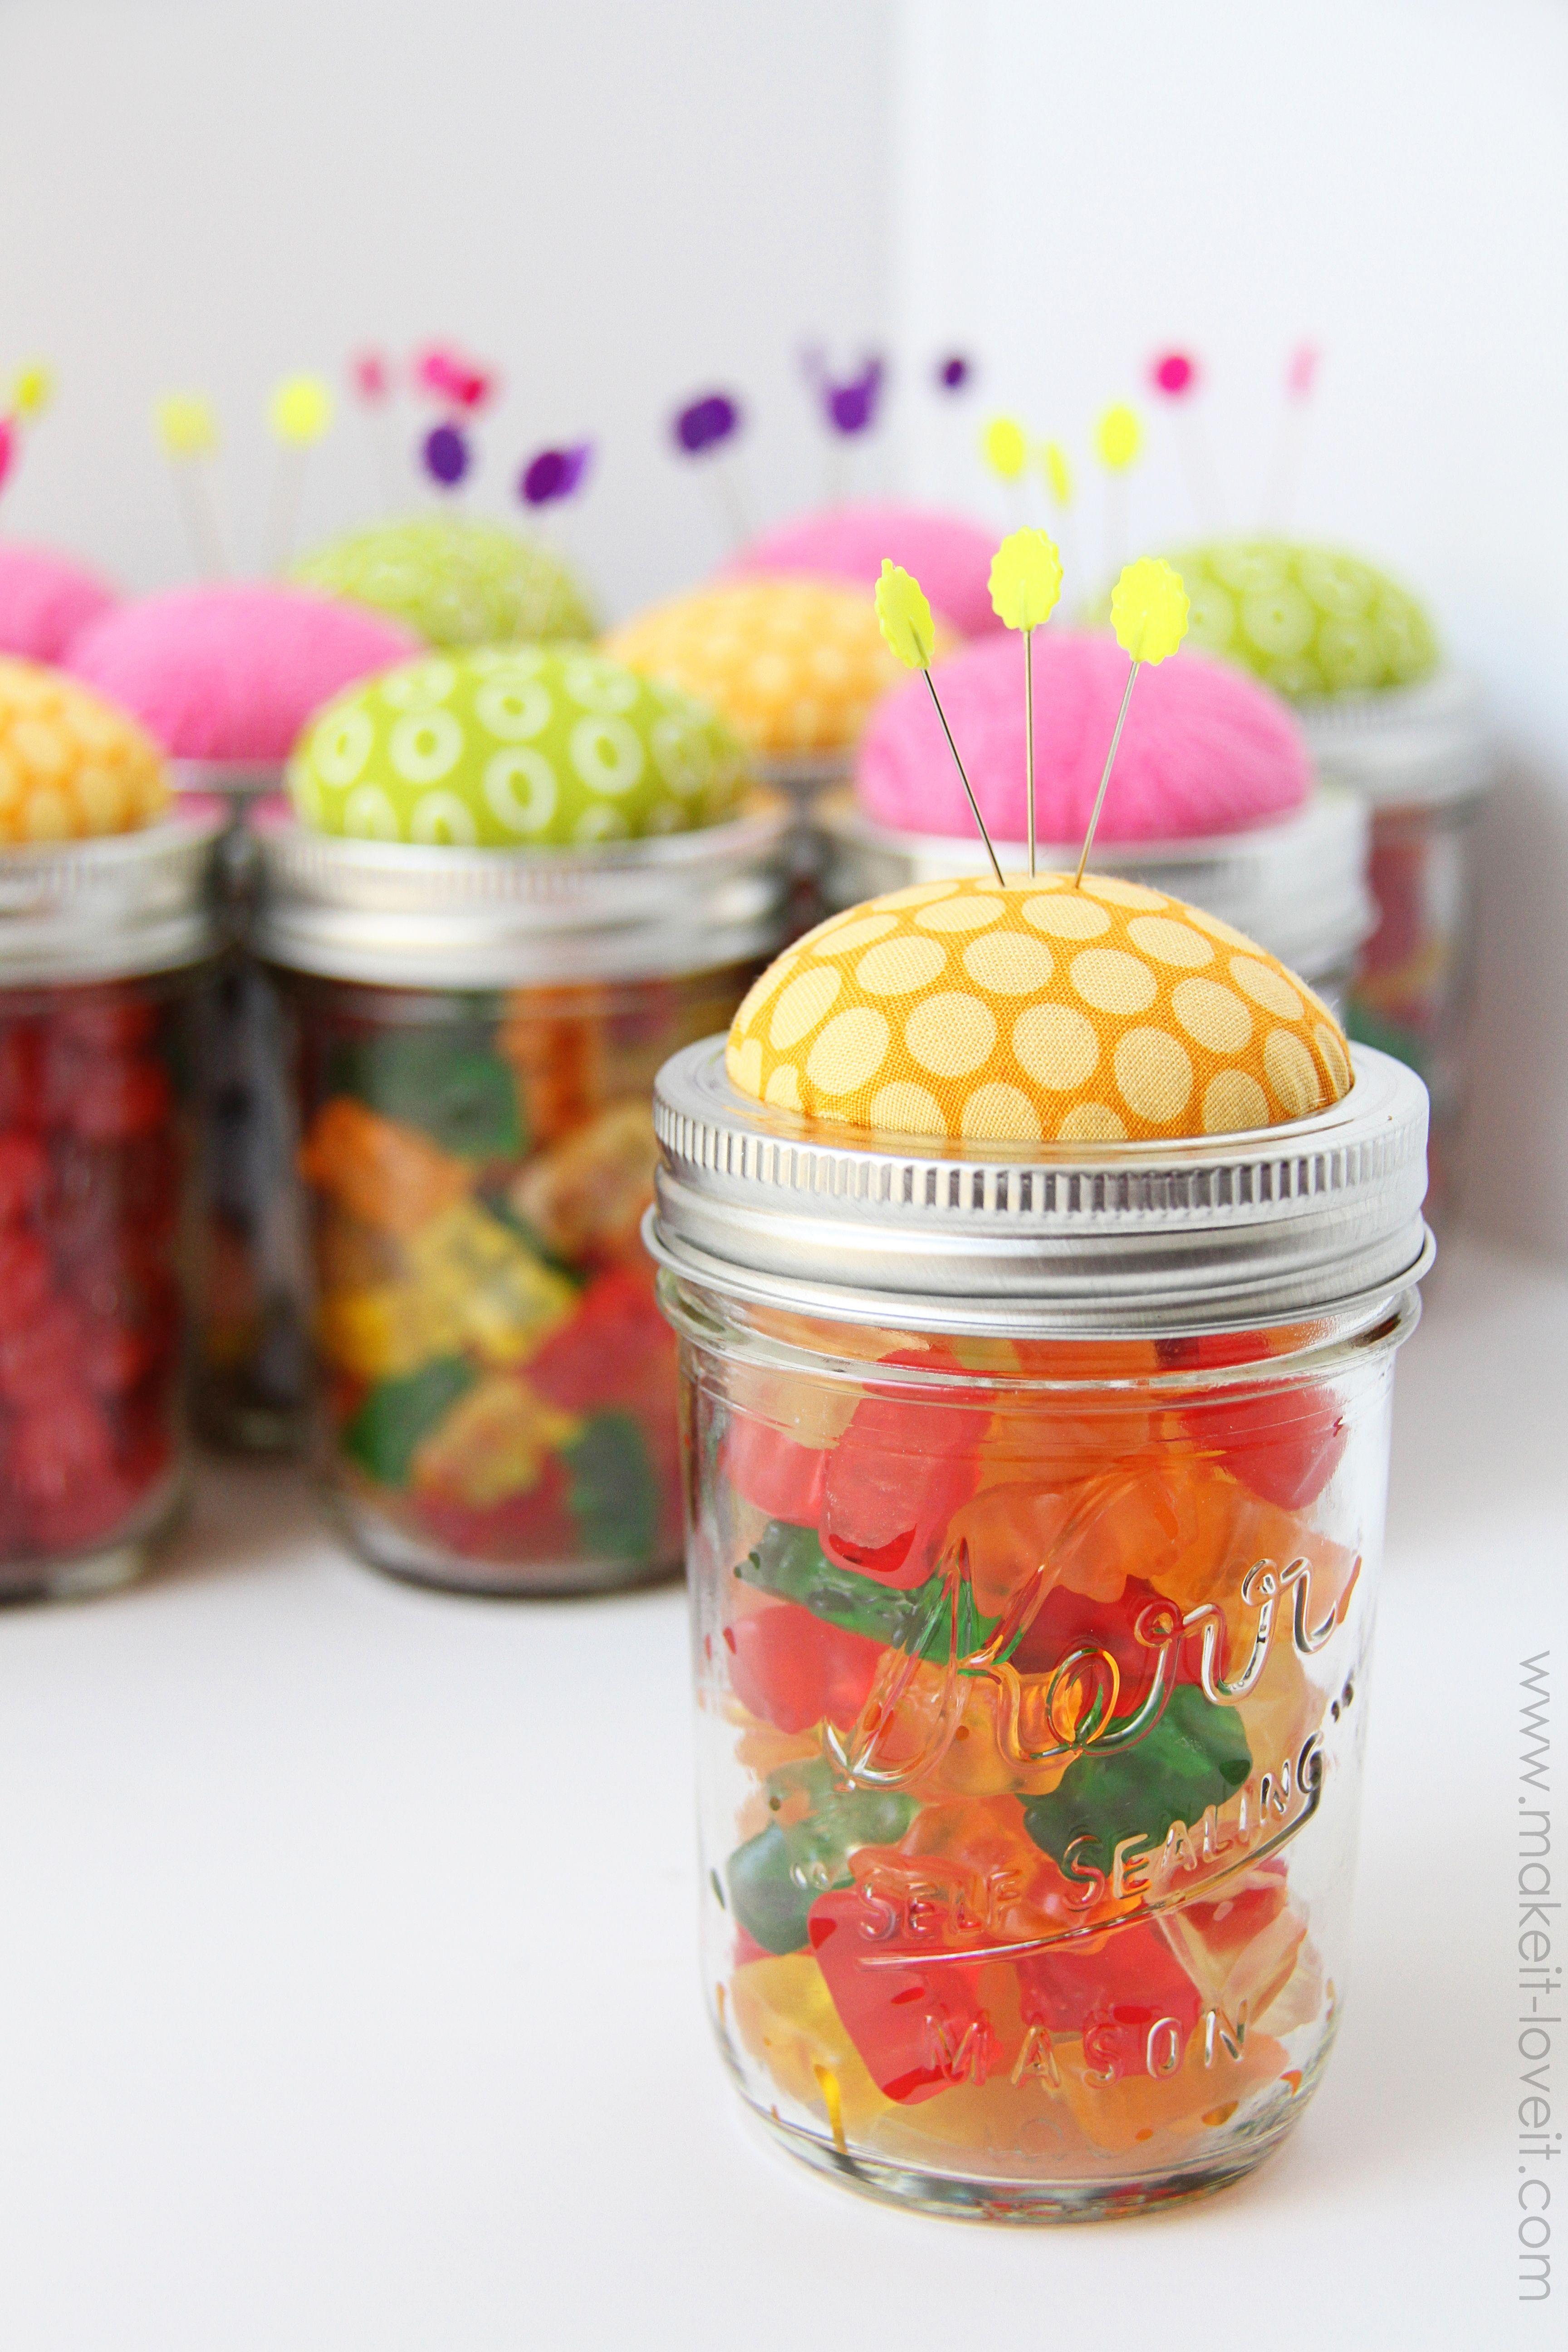 Süße Marmeladengläser mit Nadelkissen